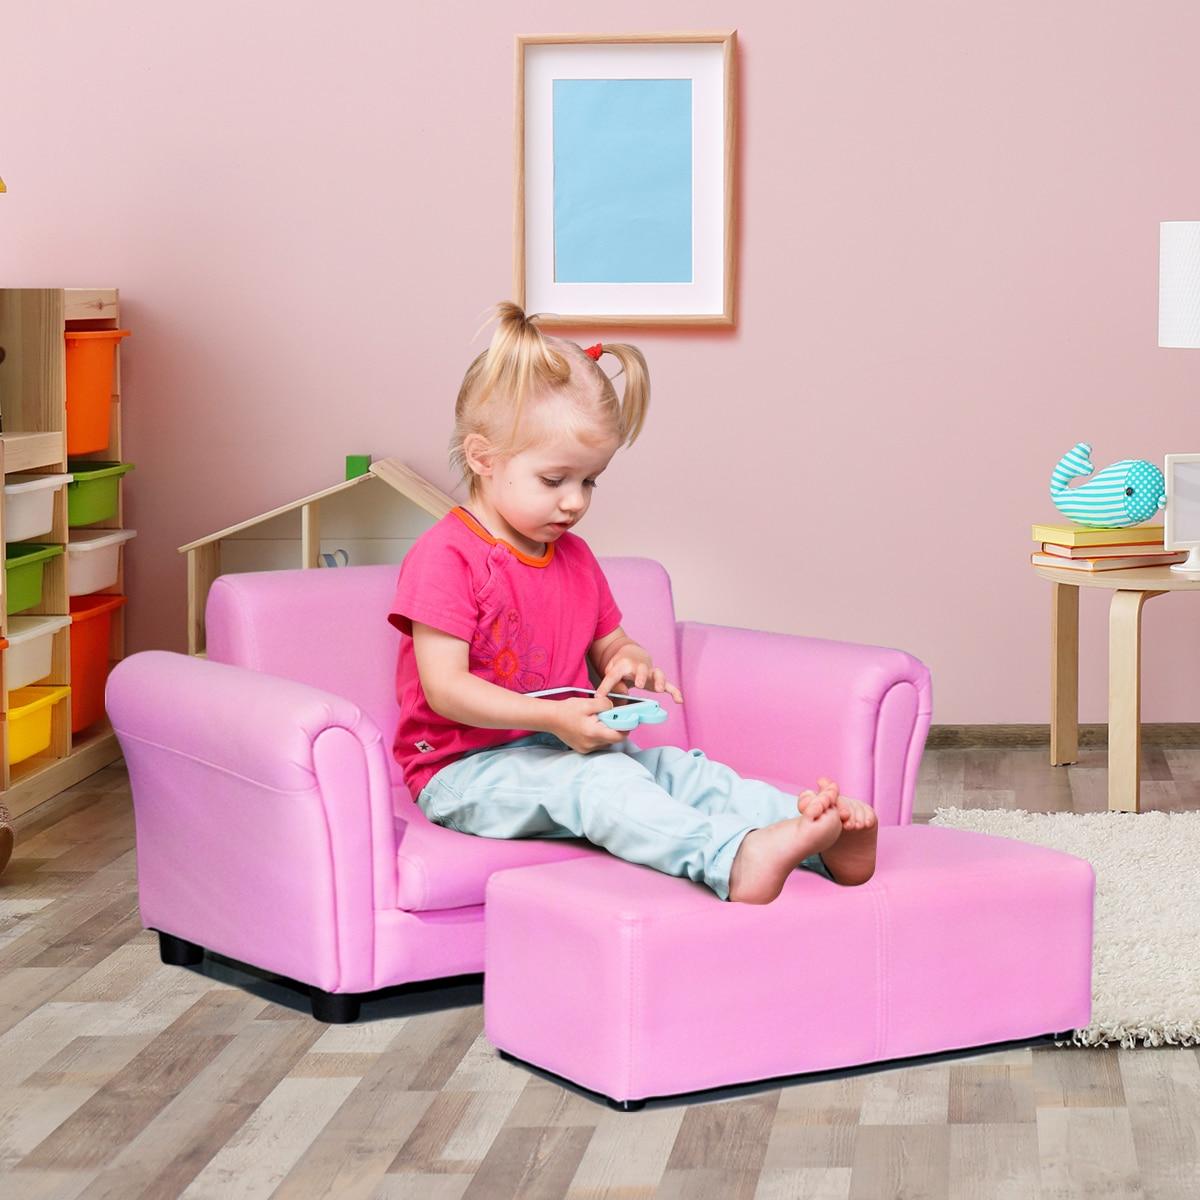 Costway Pink Kids Sofa Armrest Chair Couch Lounge Children Birthday Gift W/ Ottoman